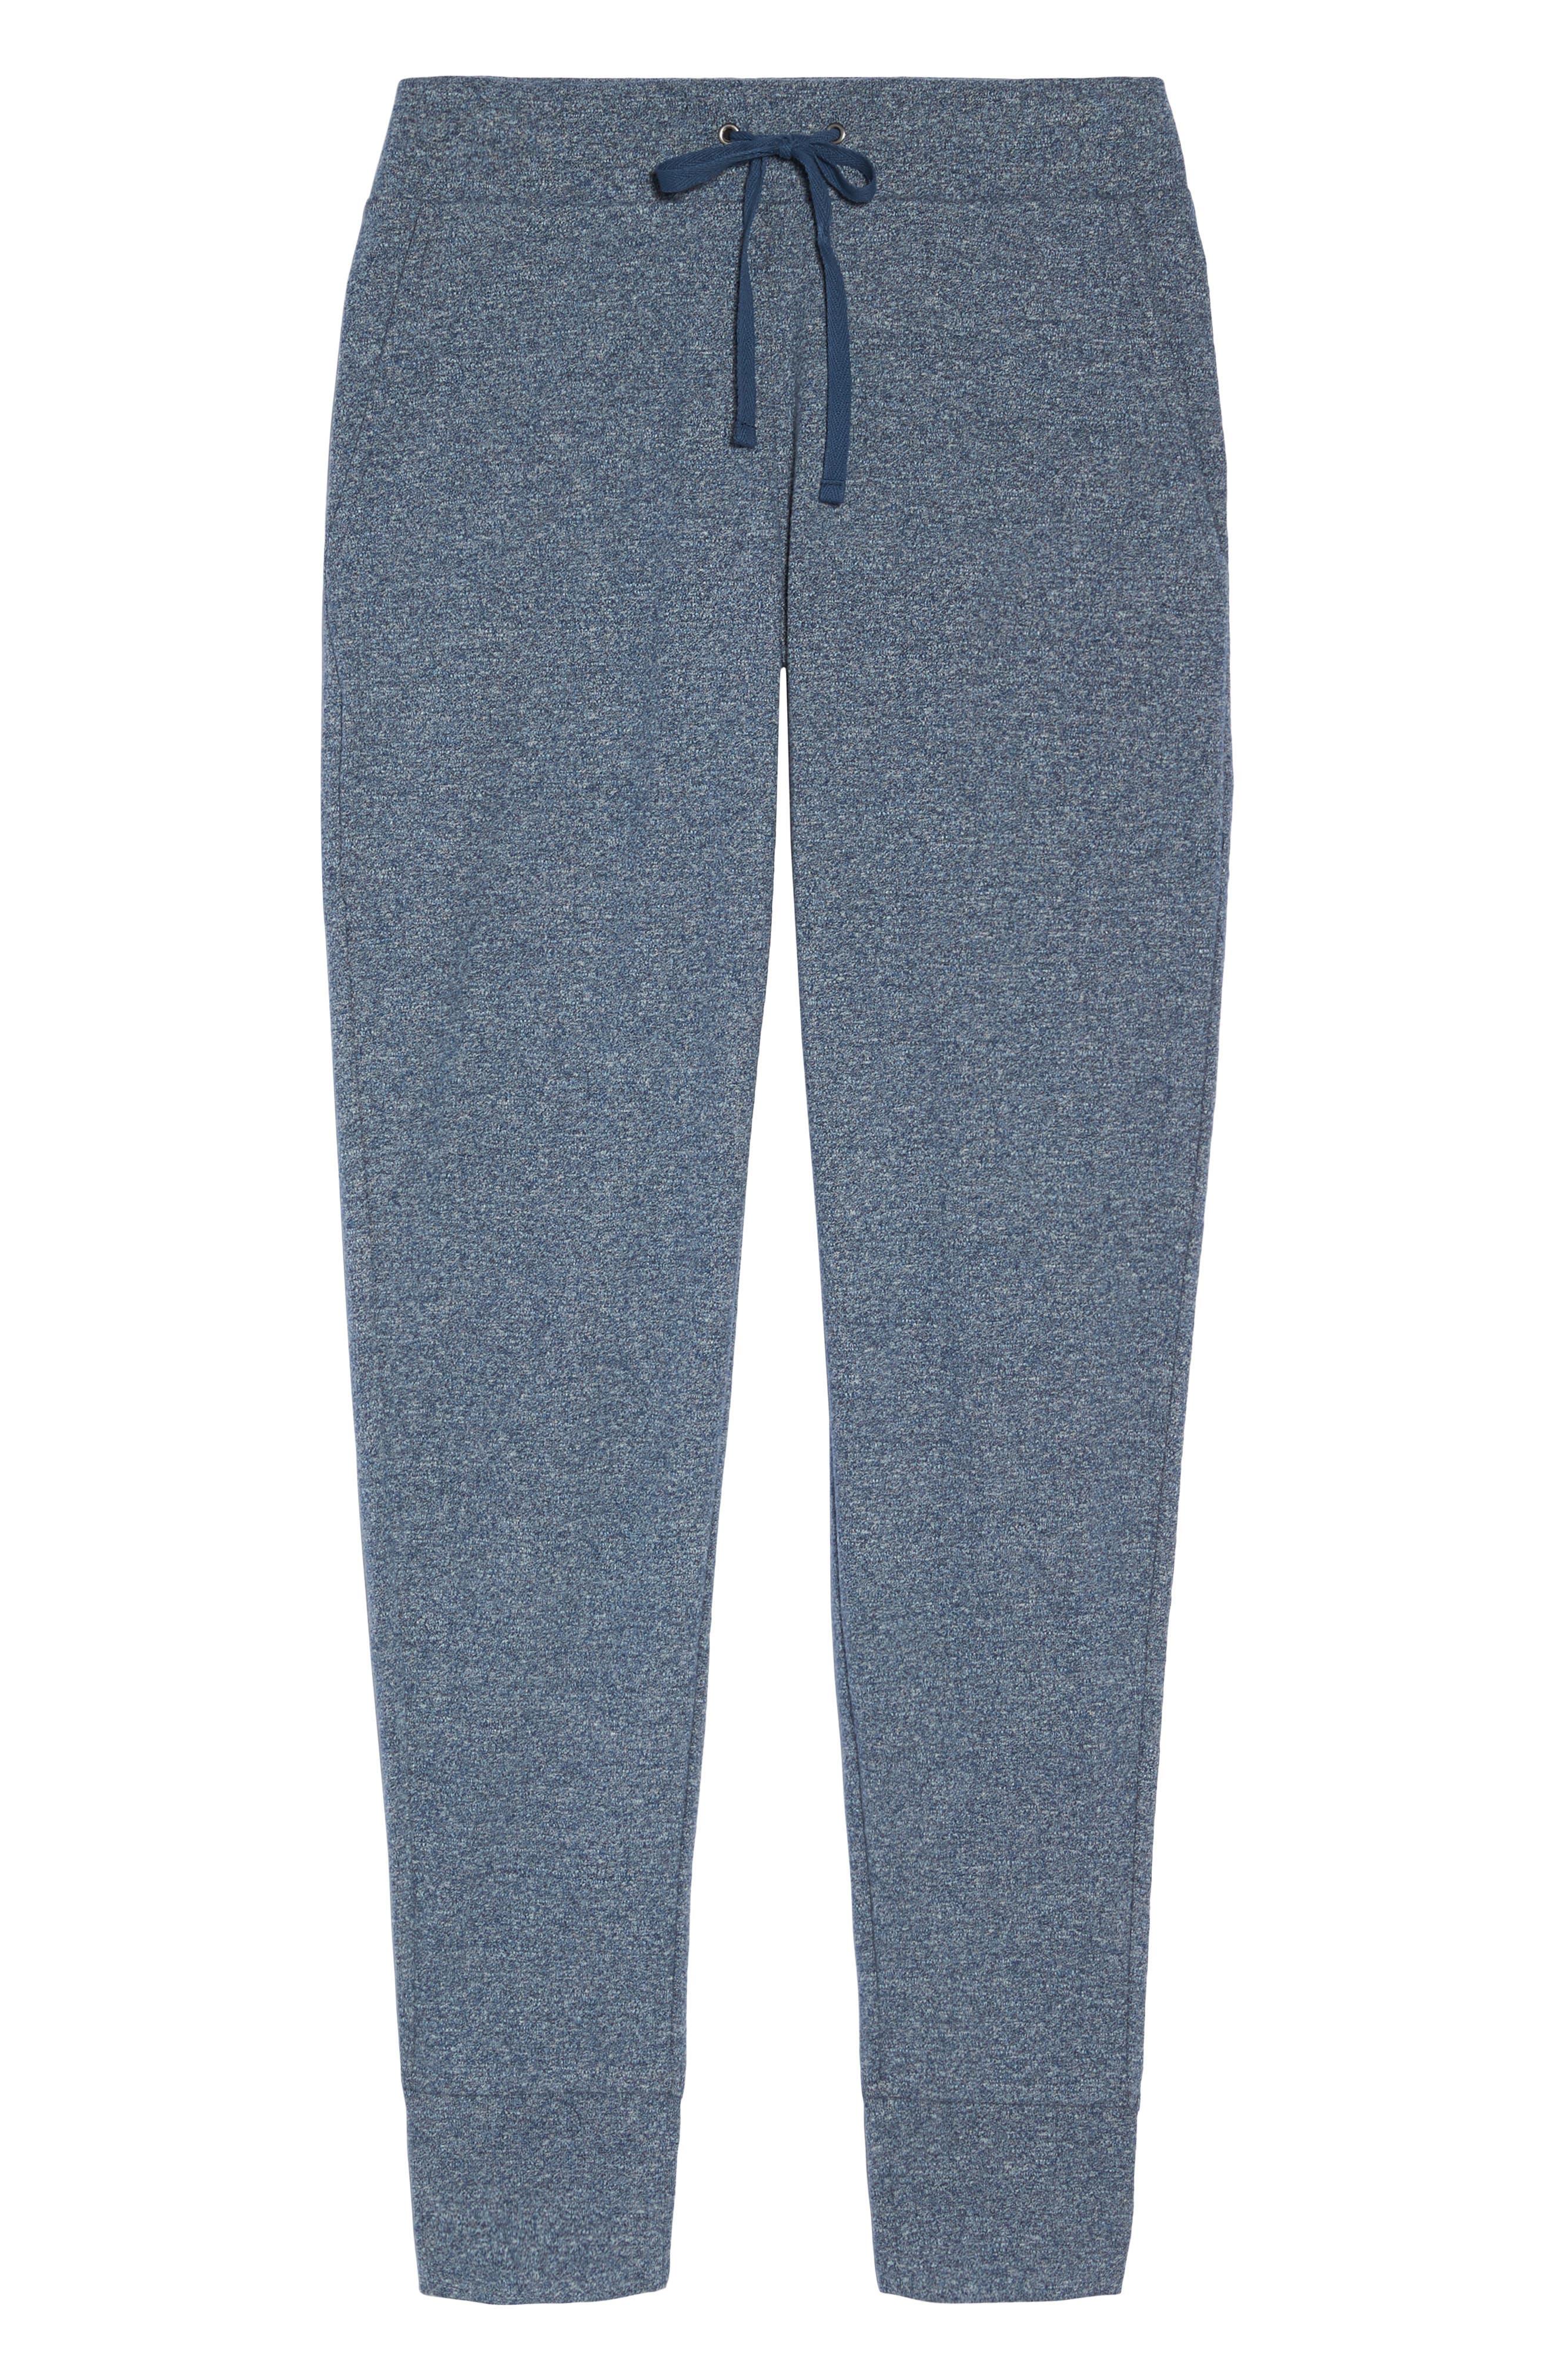 Alternate Image 4  - UGG® Clementine Cotton Sweatpants